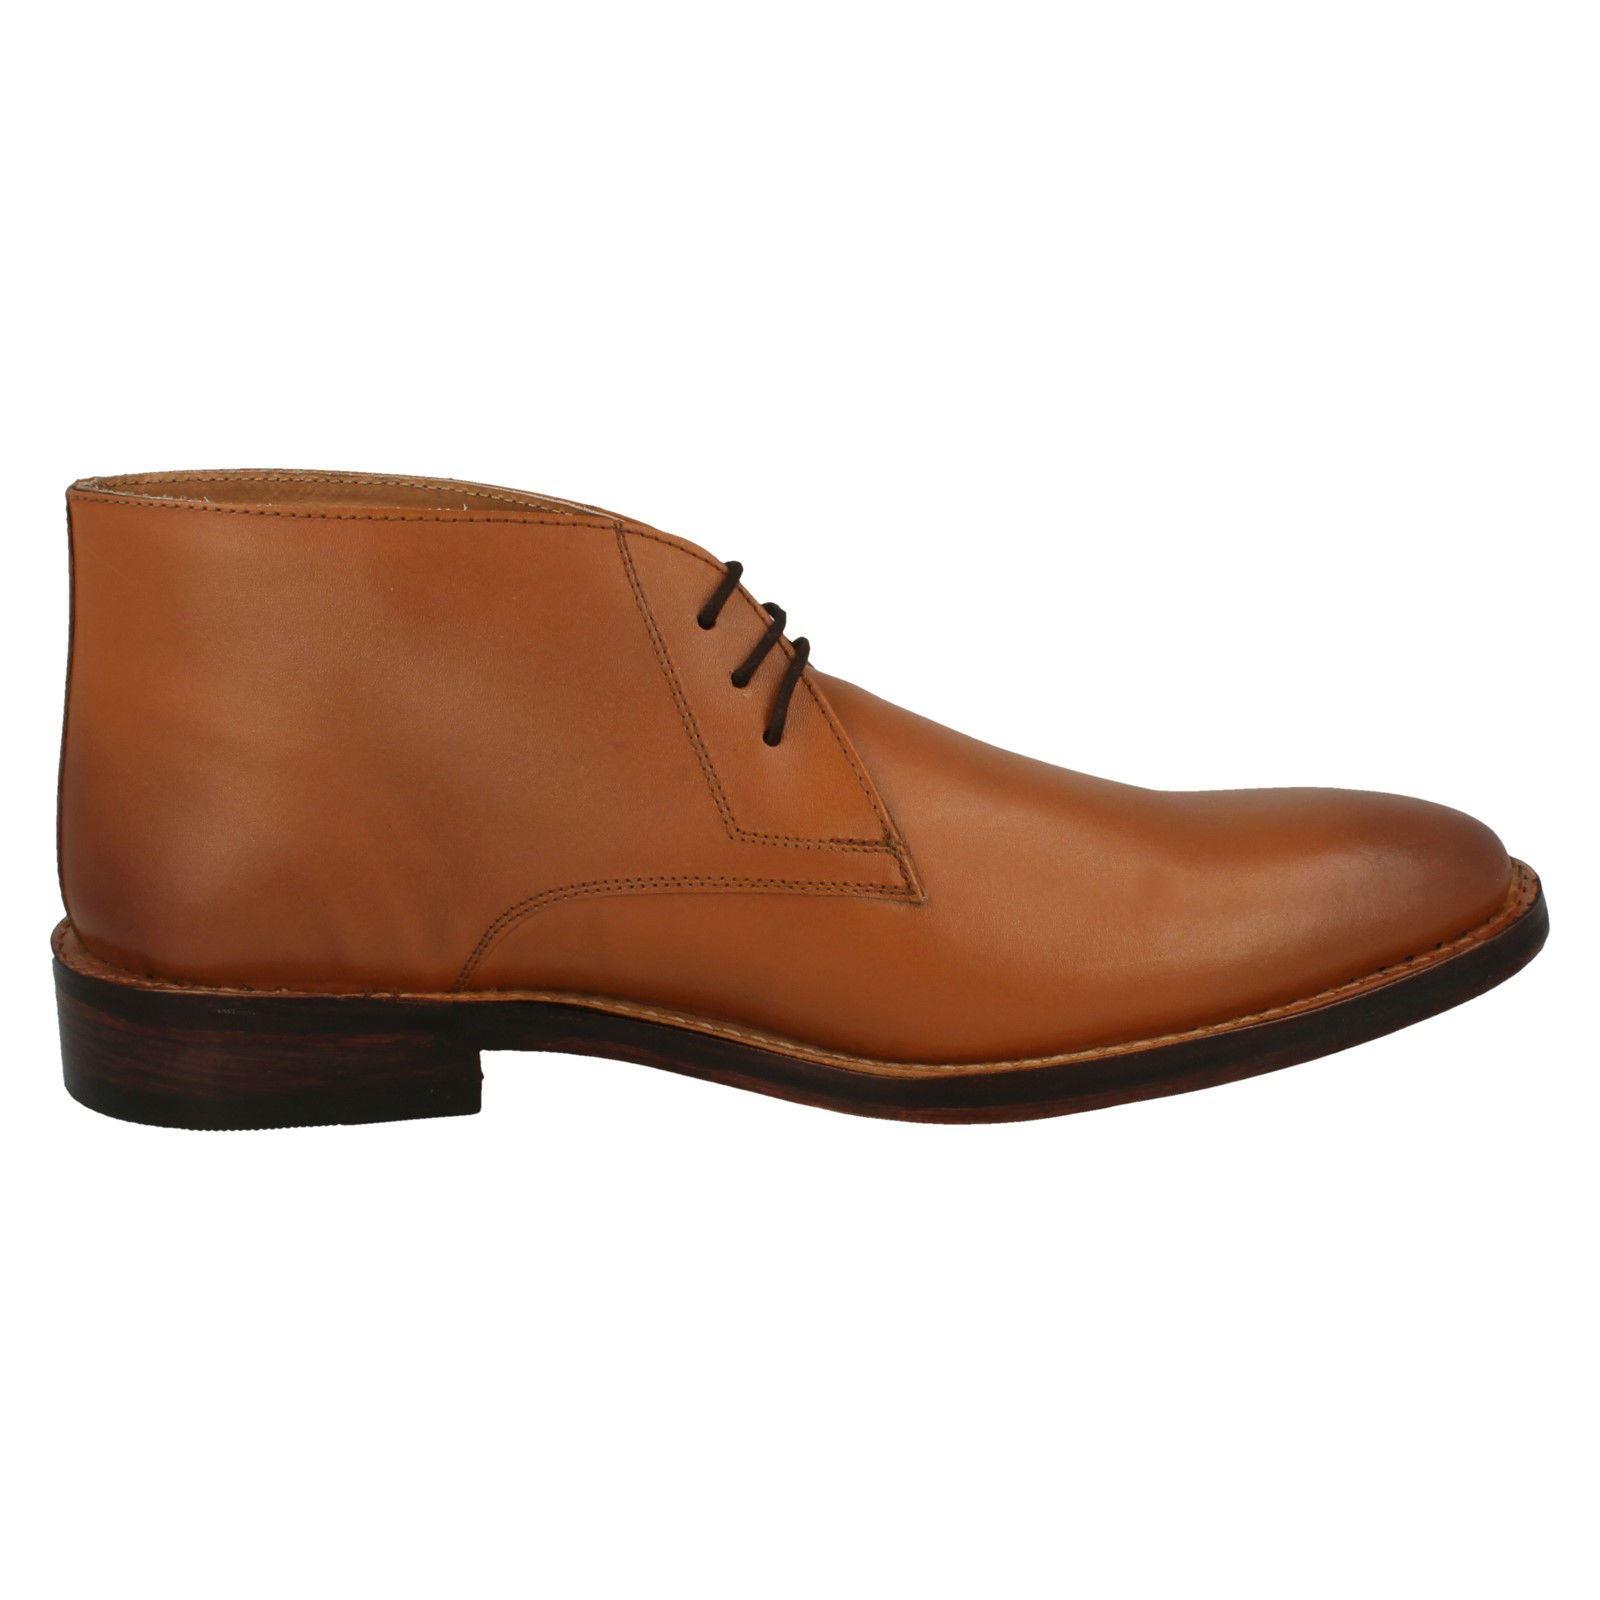 Mens-Catesby-Smart-Desert-Boot-MCW159T thumbnail 10